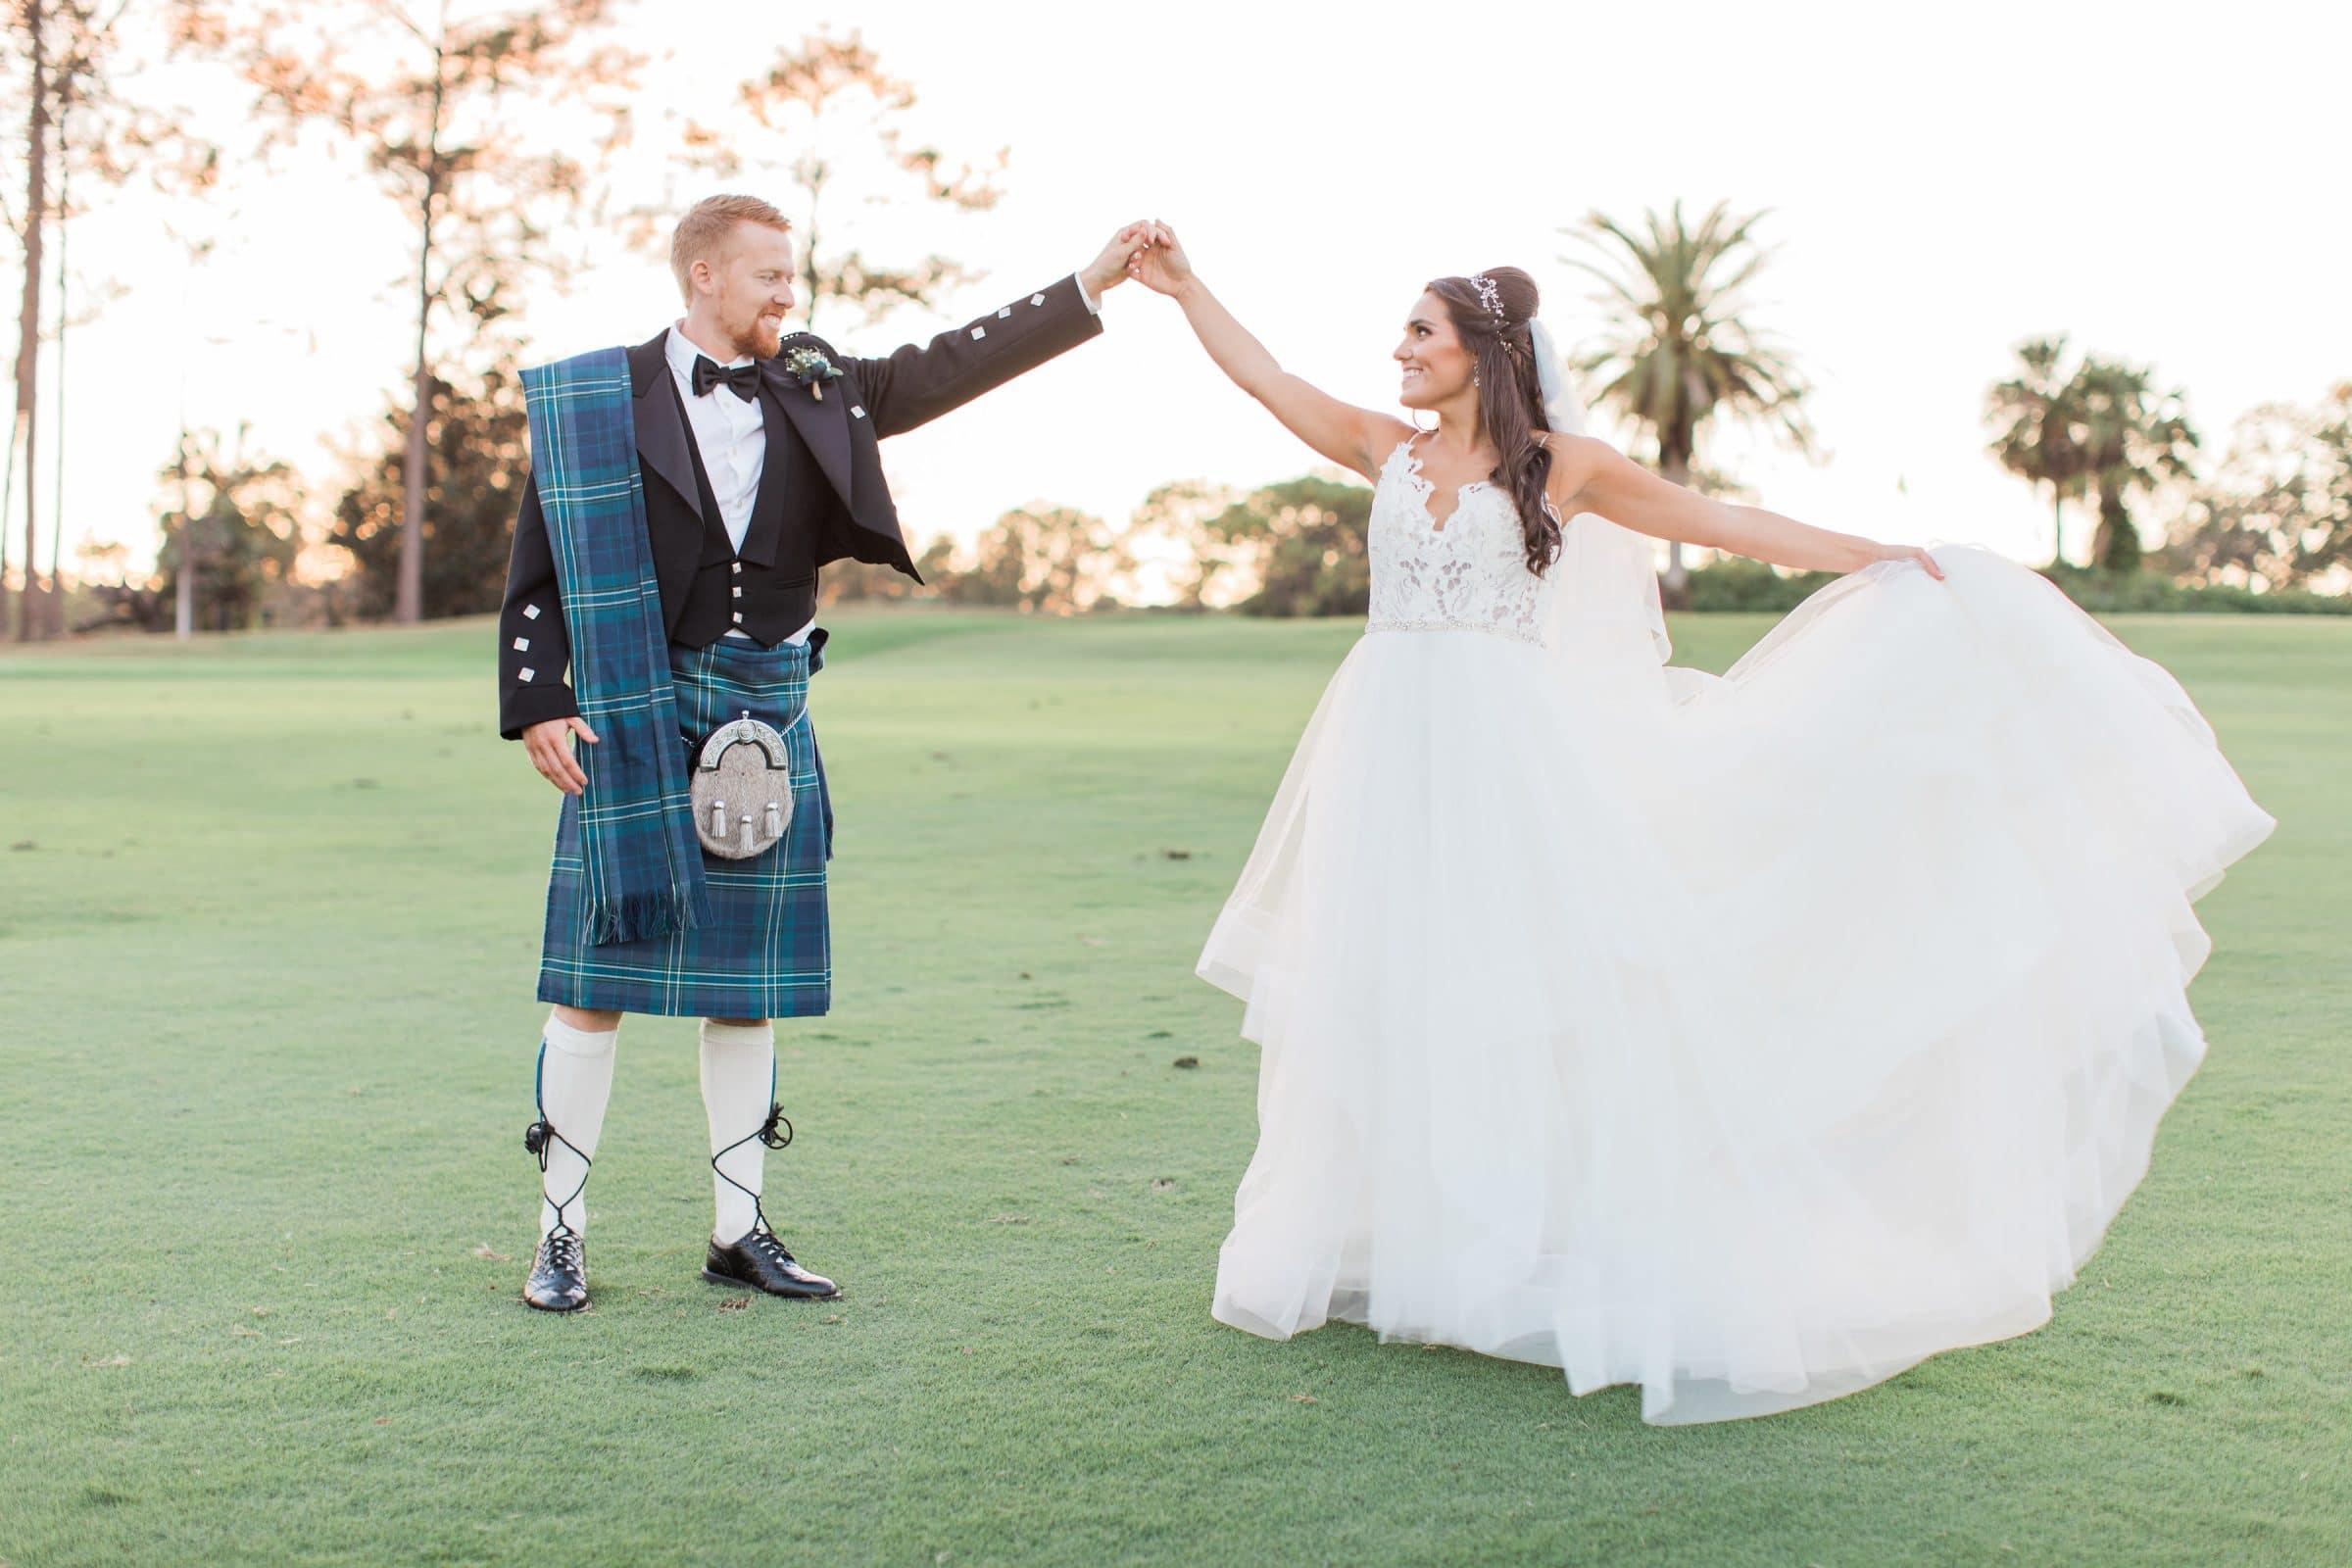 Scottish groom holding bride's upraised hand